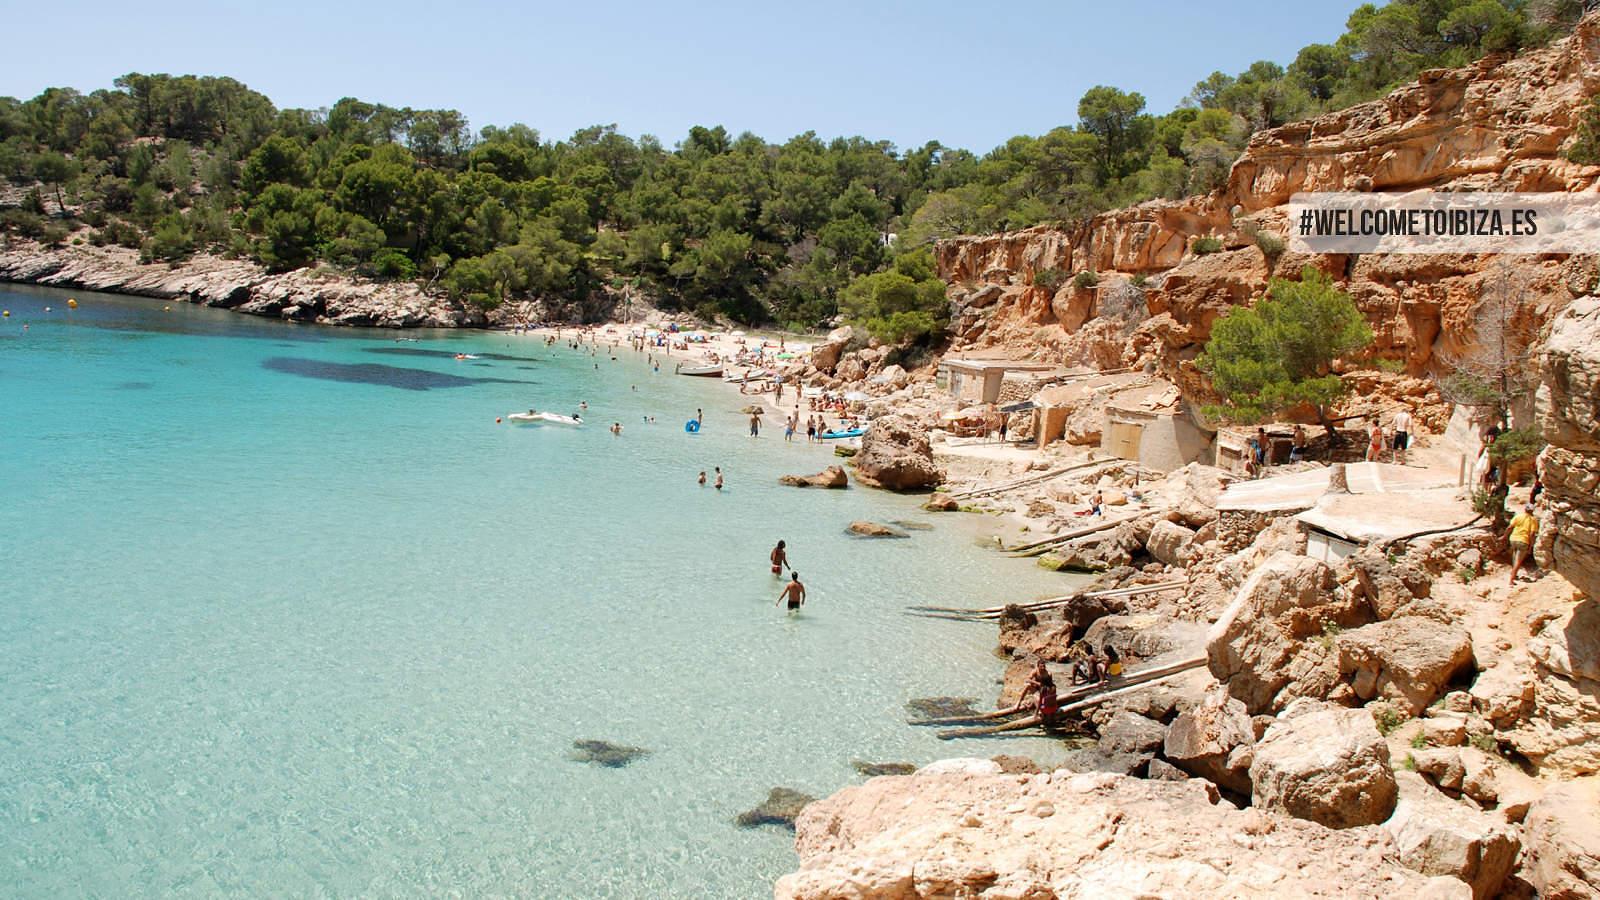 Playa cala salada Beach san antonio ibiza 2015 - 9